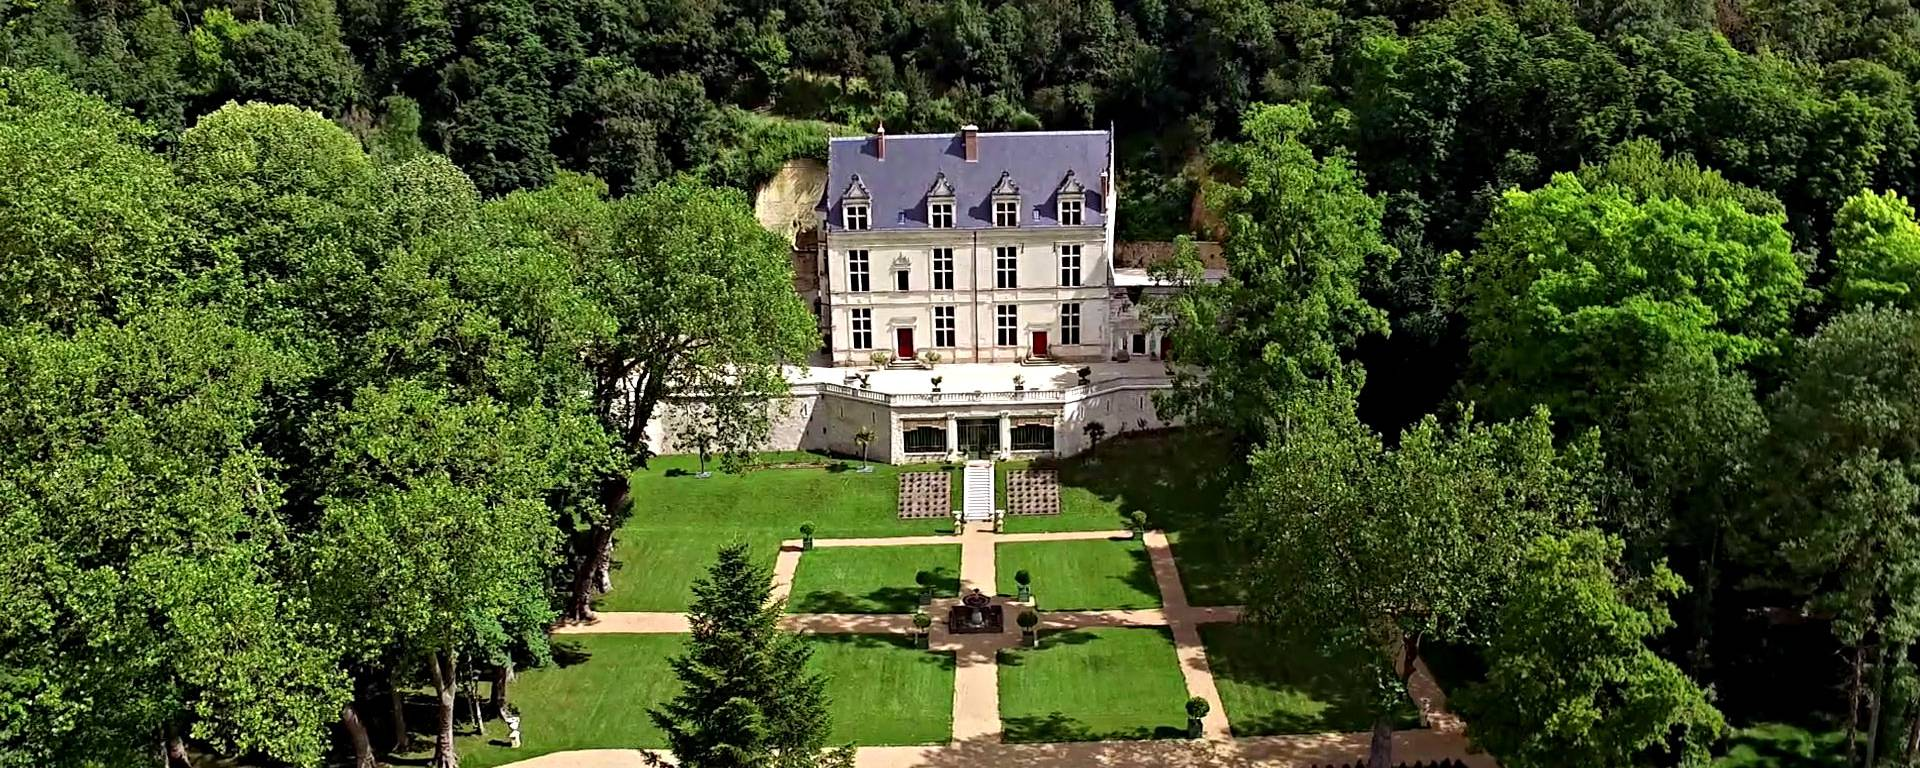 Vista aerea del castello Gaillard © OTBC